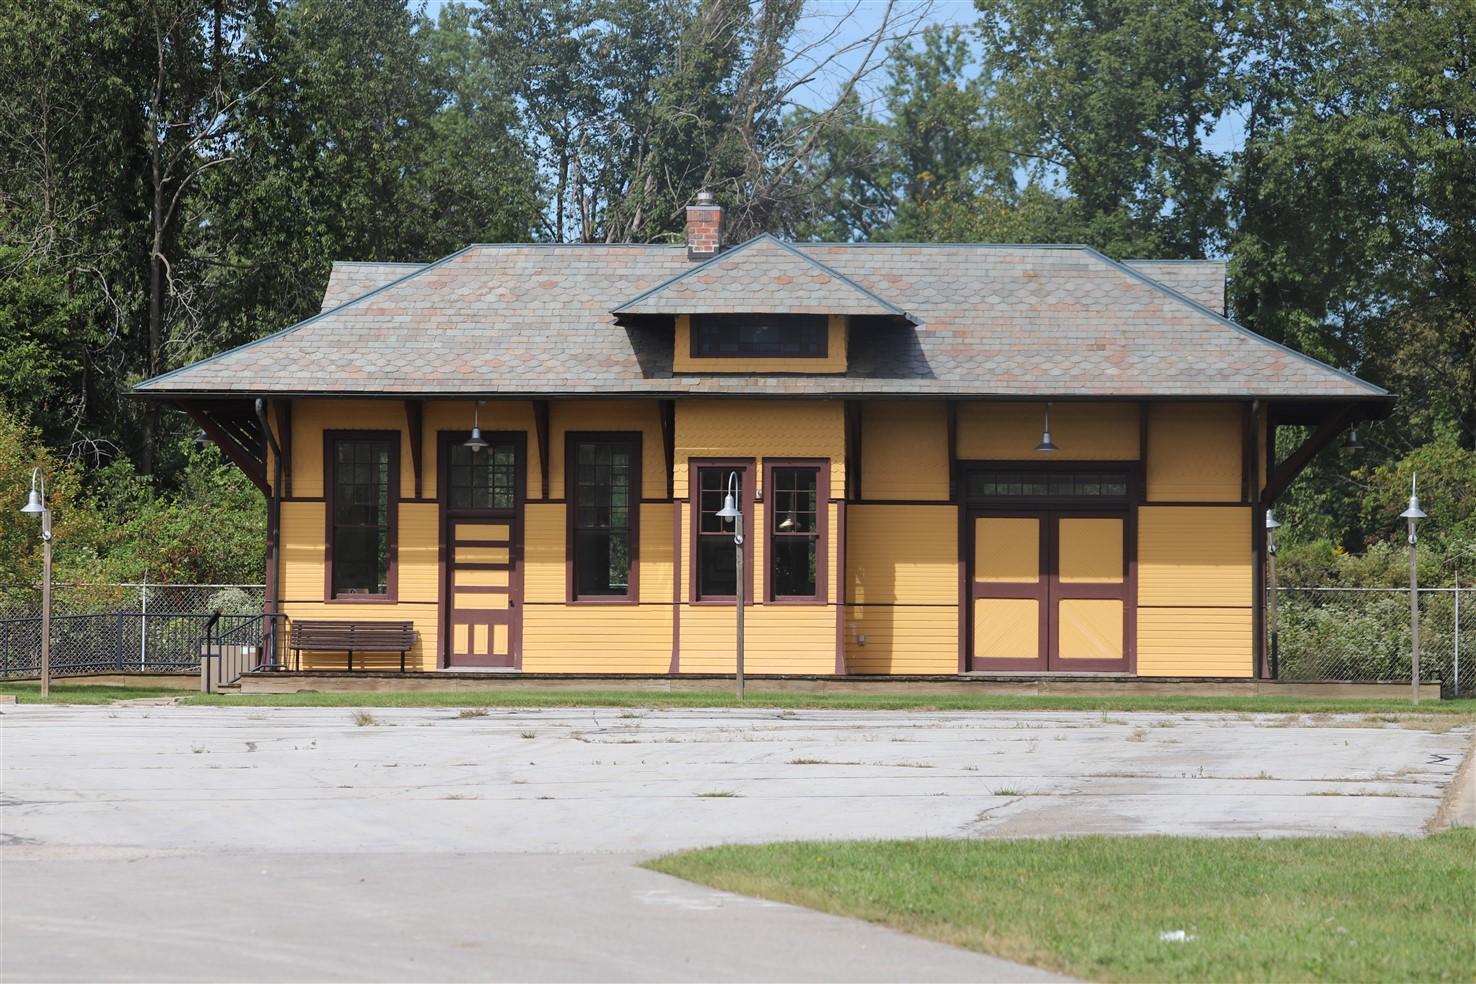 2018 09 16 469 Outville OH Train Depot.jpg